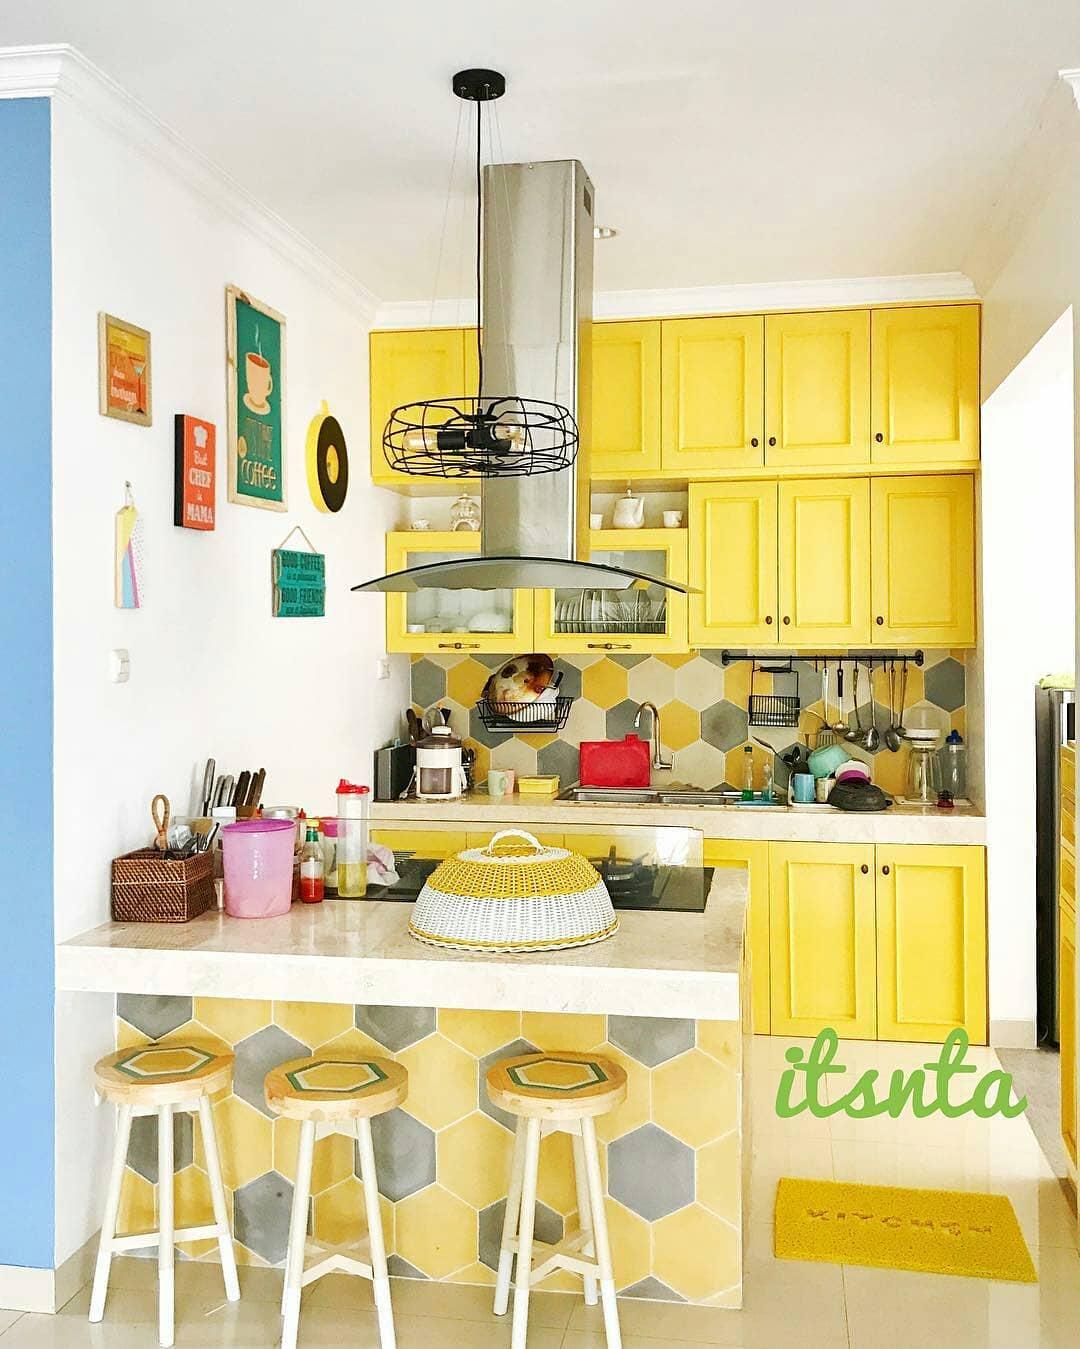 Desain Dapur Minimalis Warna Kuning Arsihome